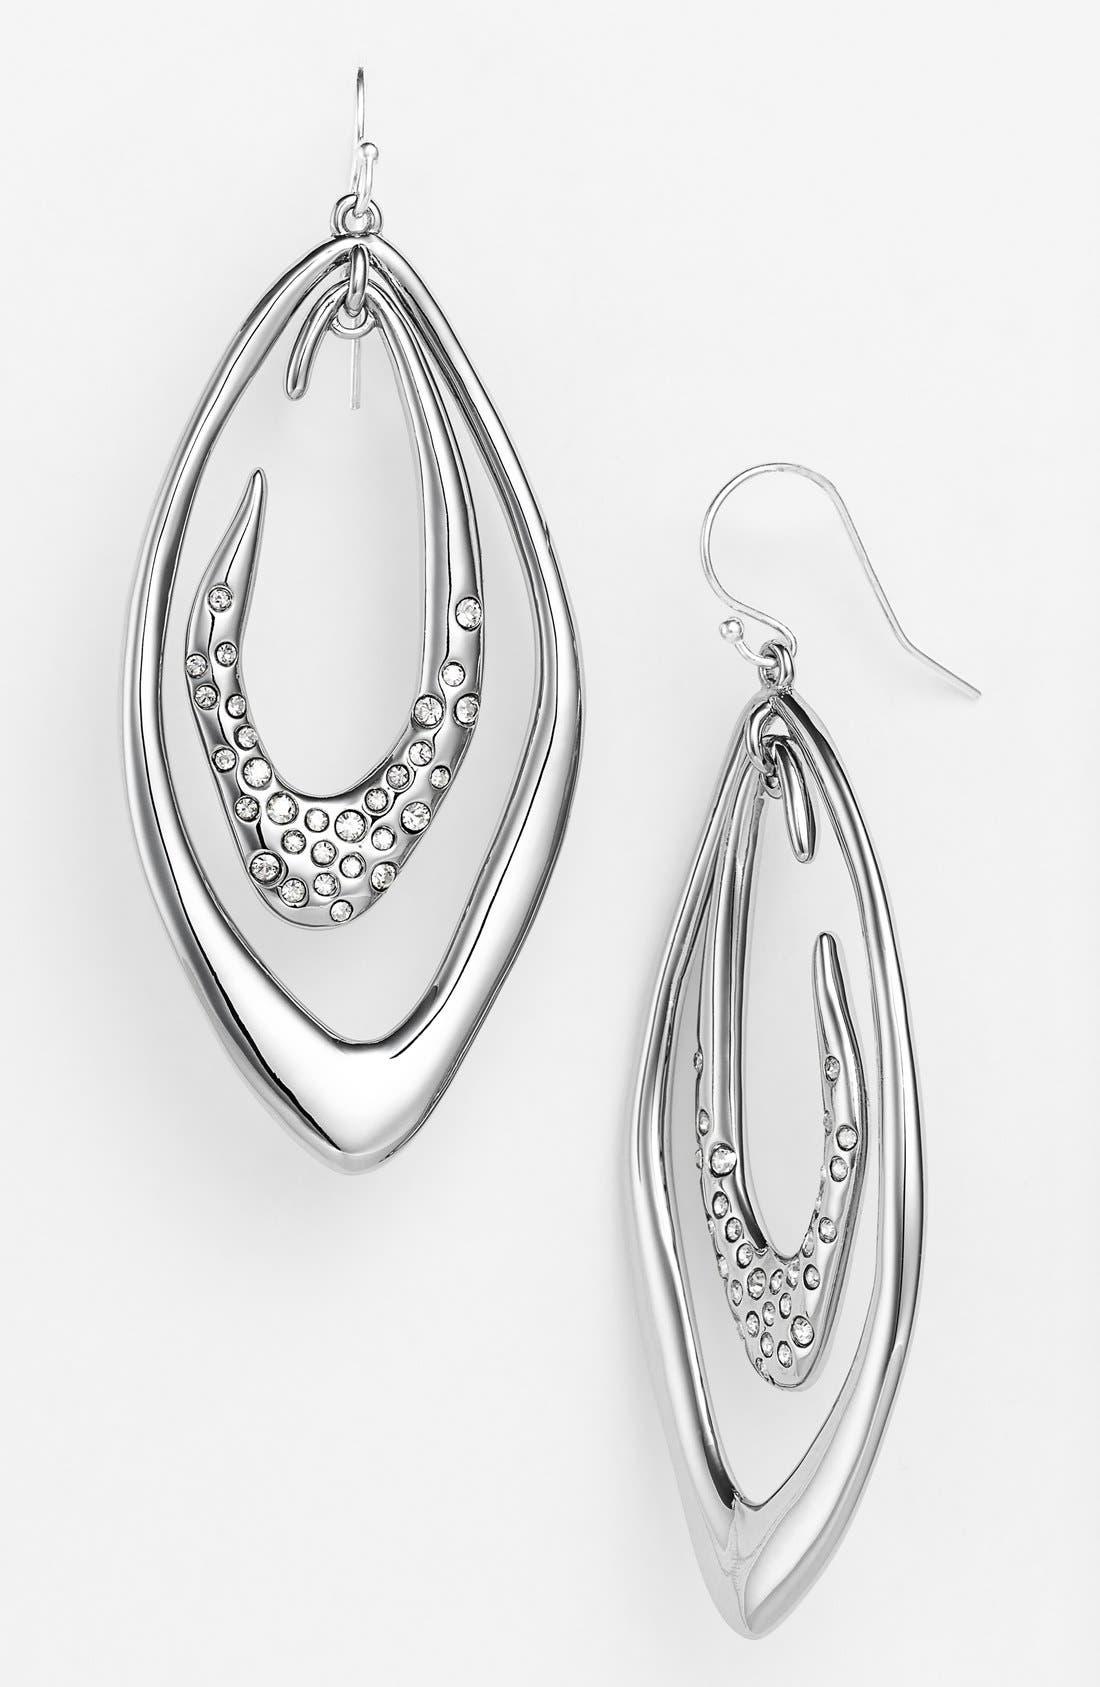 Alternate Image 1 Selected - Alexis Bittar 'Miss Havisham - Liquid' Orbiting Drop Earrings